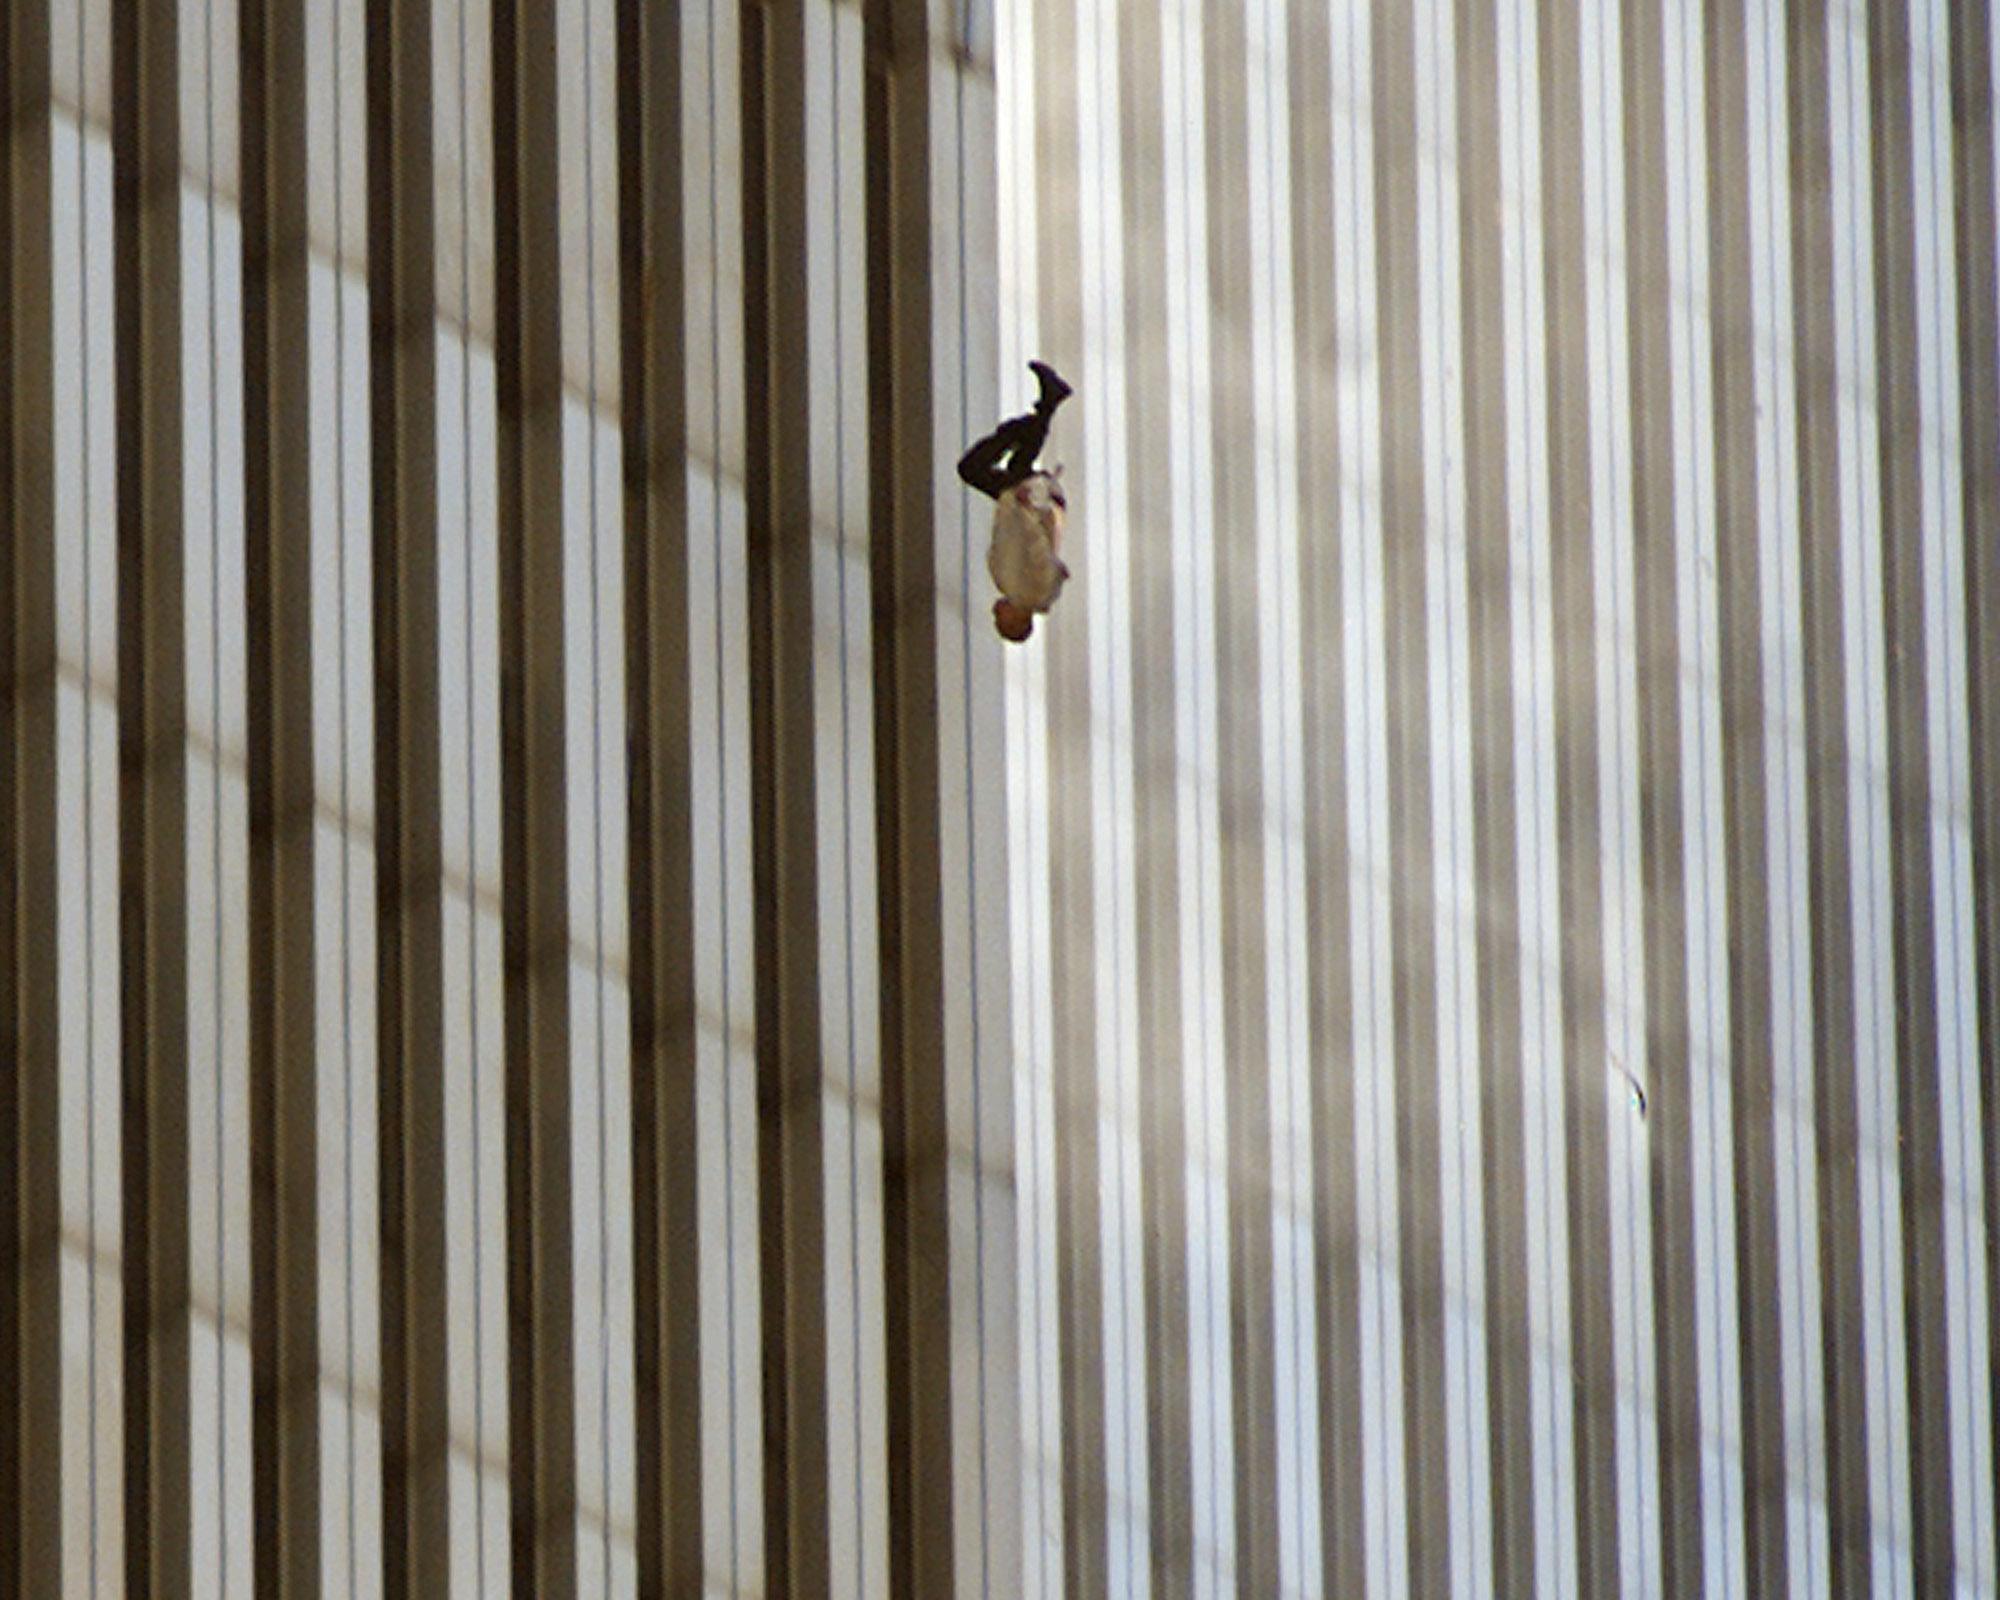 Sept. 11, 2001.